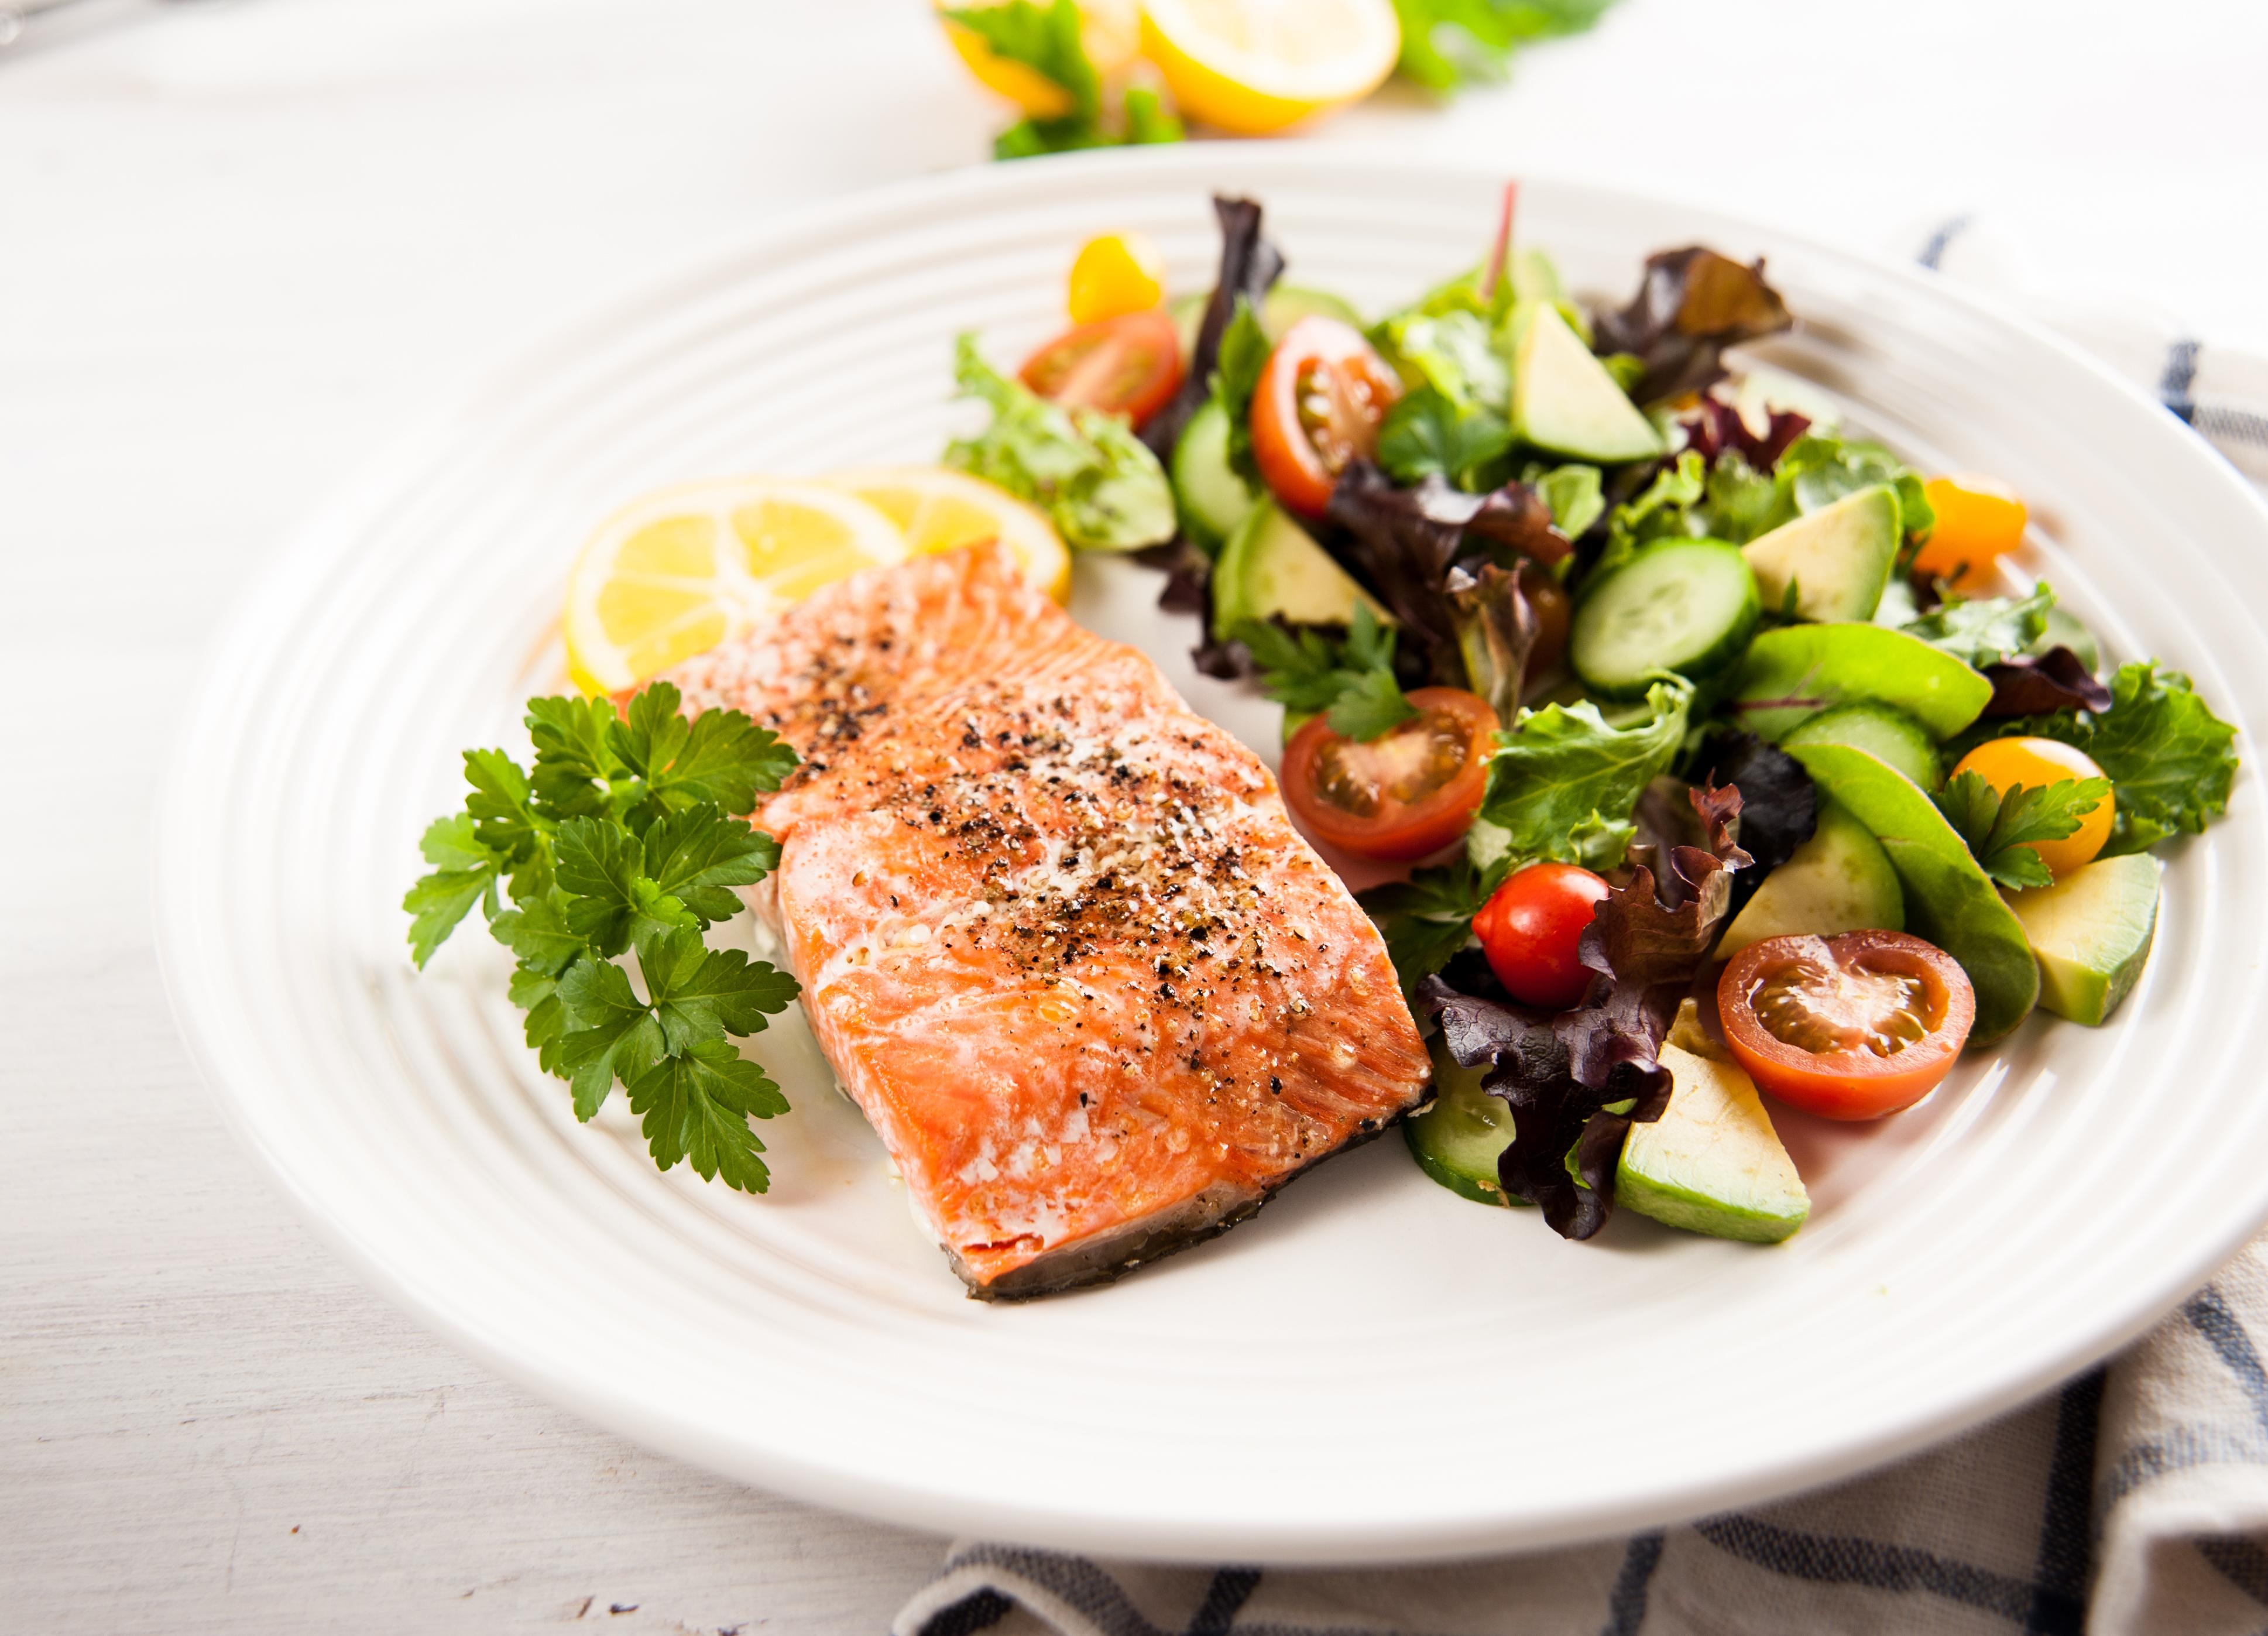 Grilled Mediterranean Salmon with Avocado Broccoli side salad